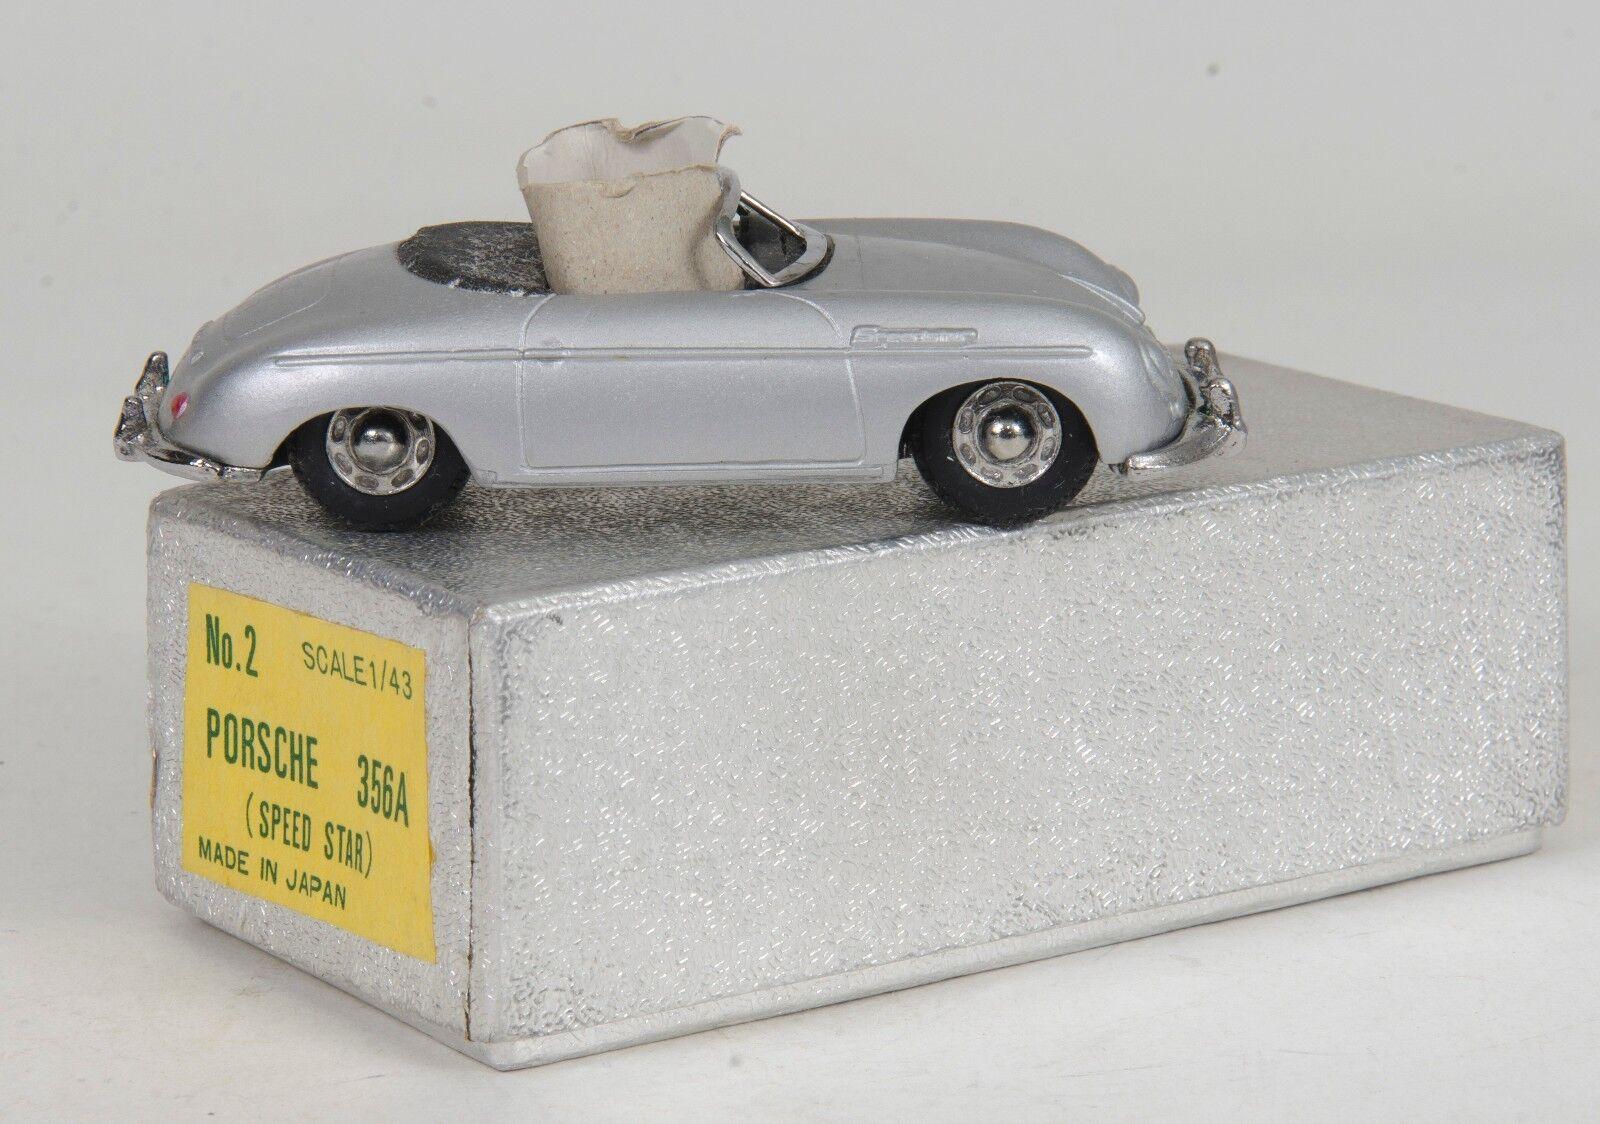 Porsche 356A 1 43 Scale Very Rare Japanese model. Boxed. Original 1970's